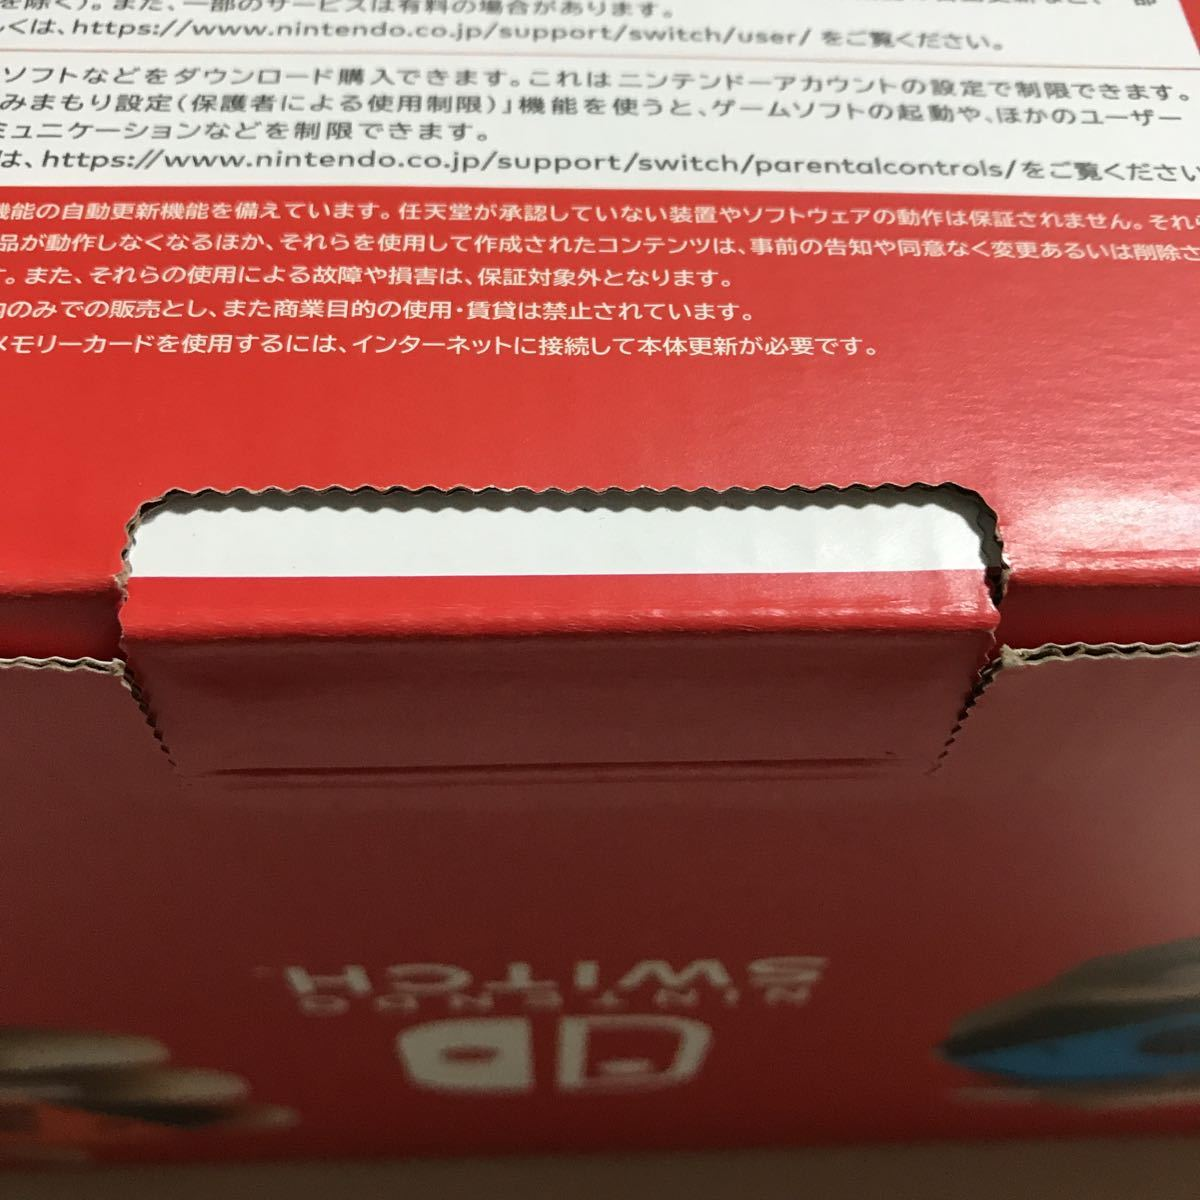 Nintendo Switch本体Joy-Con(L)ネオンブルー/(R)ネオンレッド新型 おまけ付 [新品未開封] 送料無料 ニンテンドースイッチ本体 任天堂 _画像3